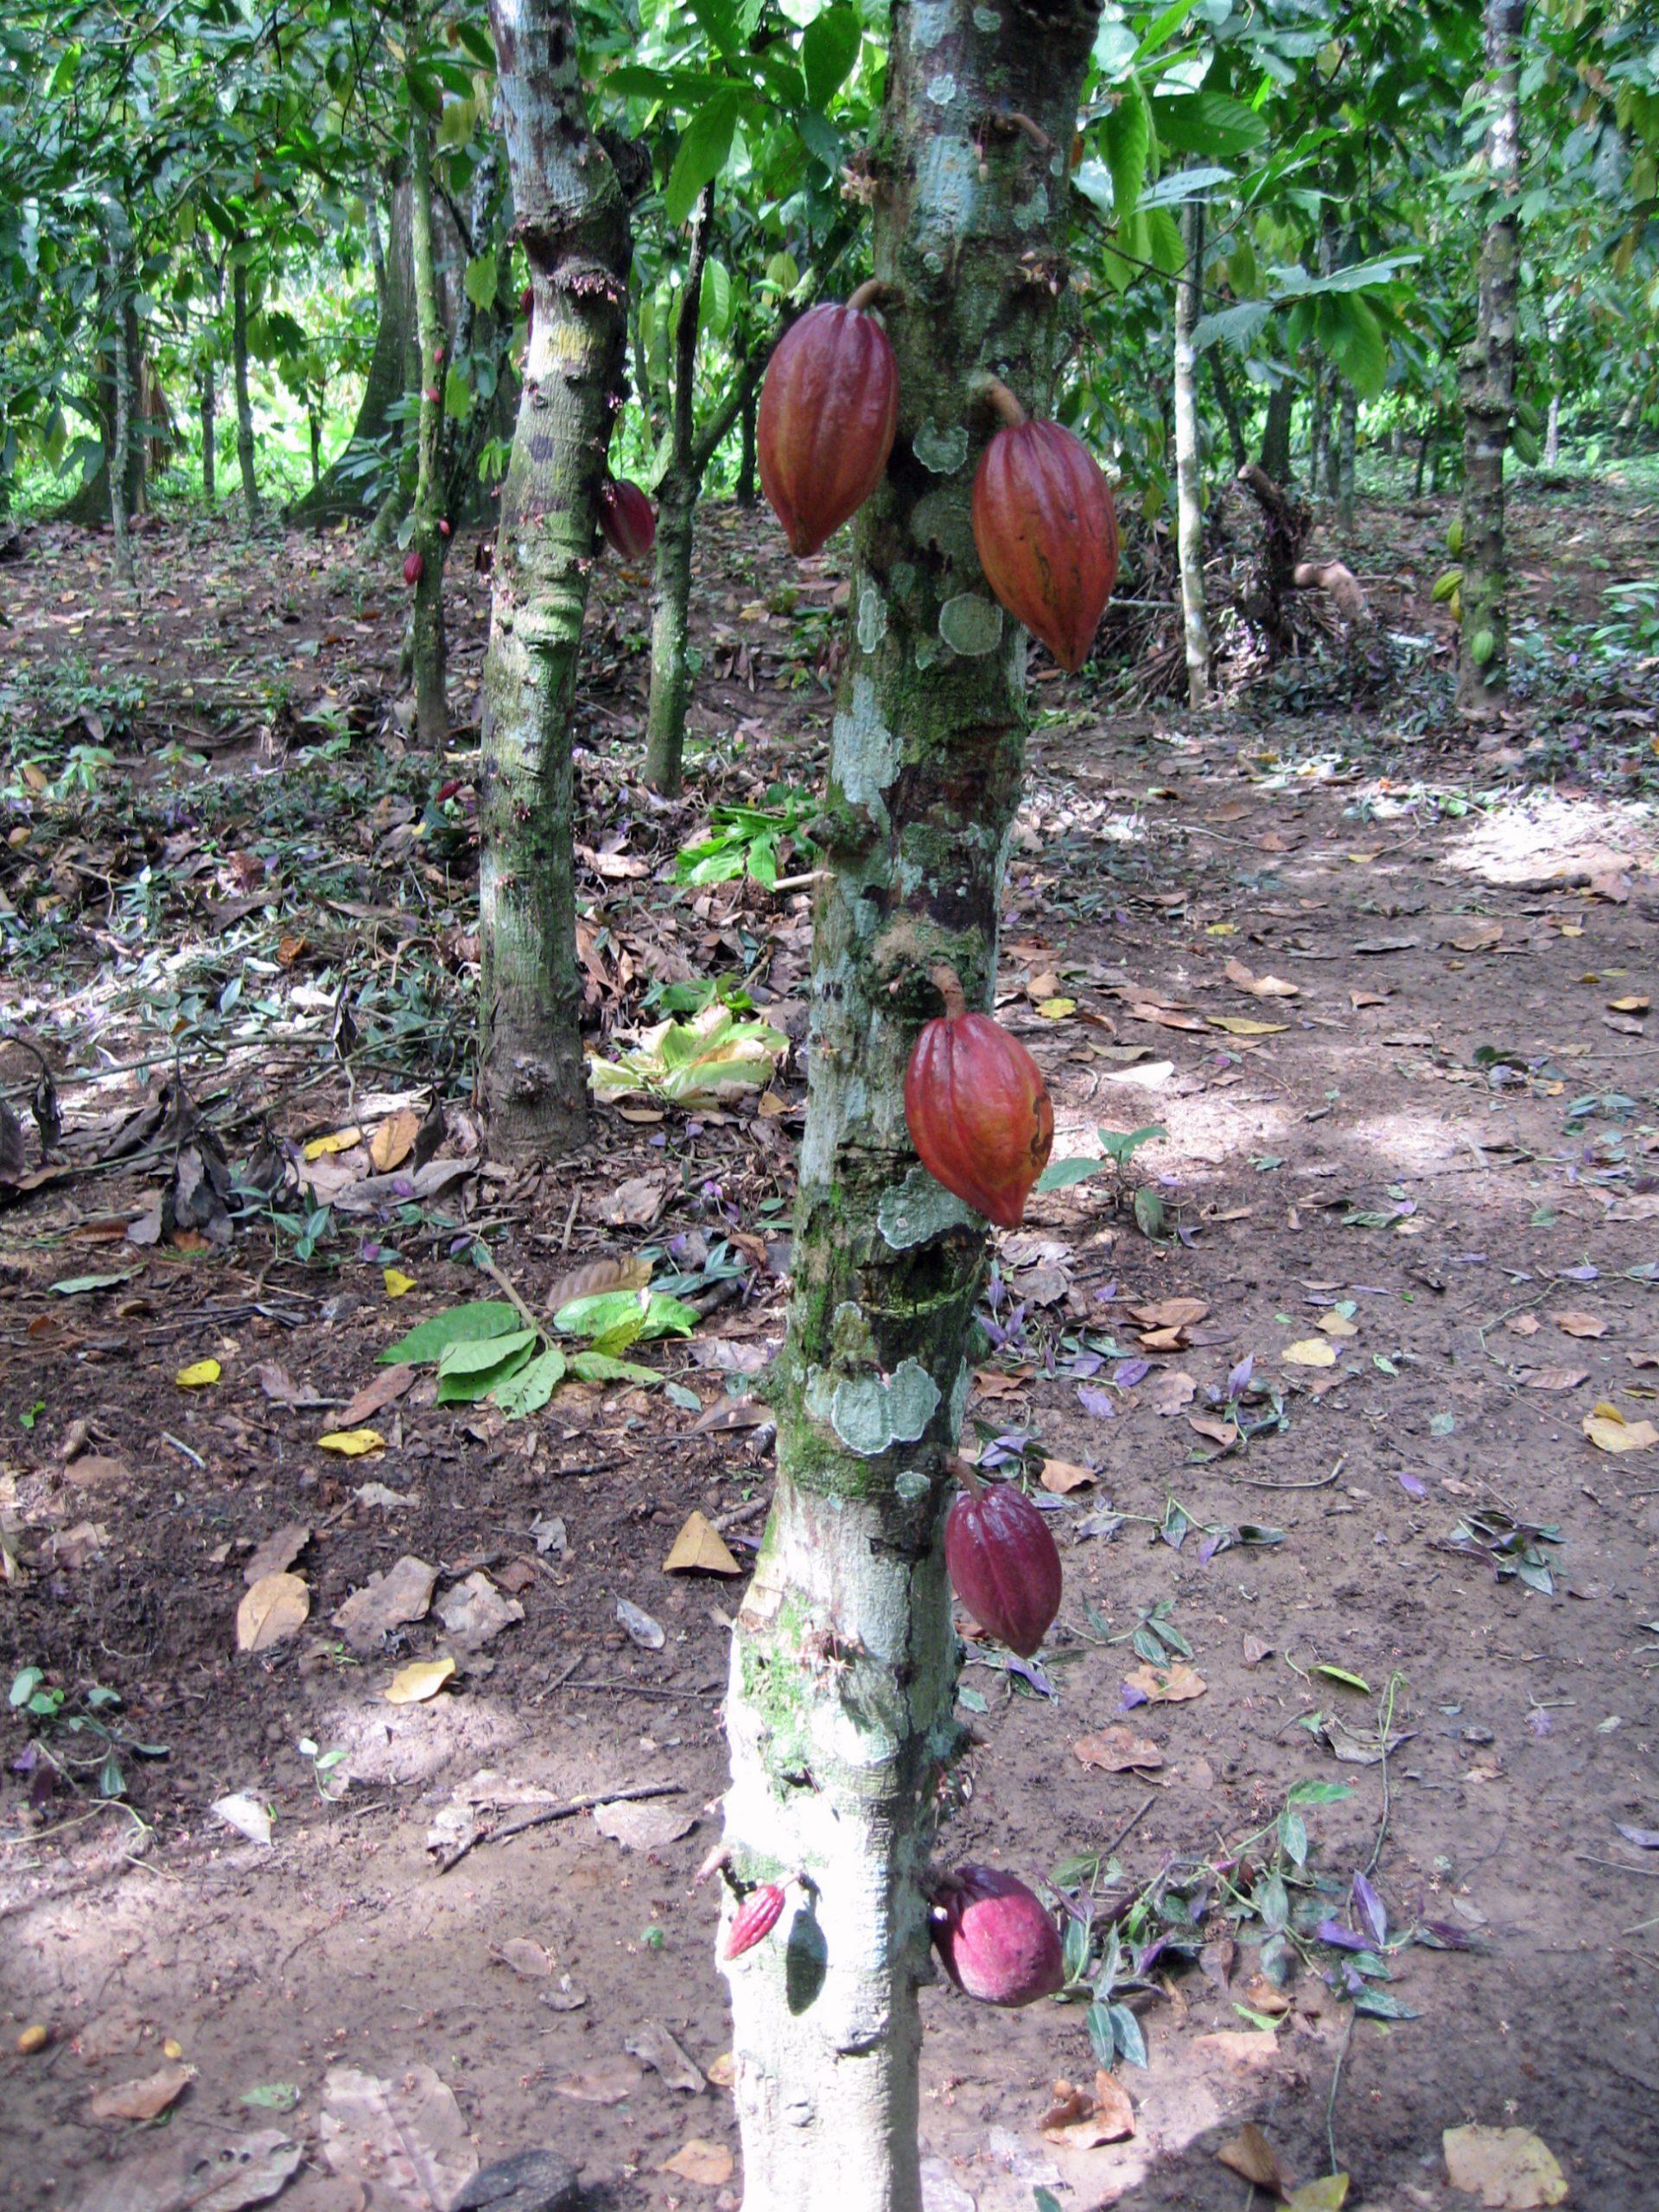 Cocoa plantation, Bukare, Sucre, Venezuela, Jun 2010, CJ